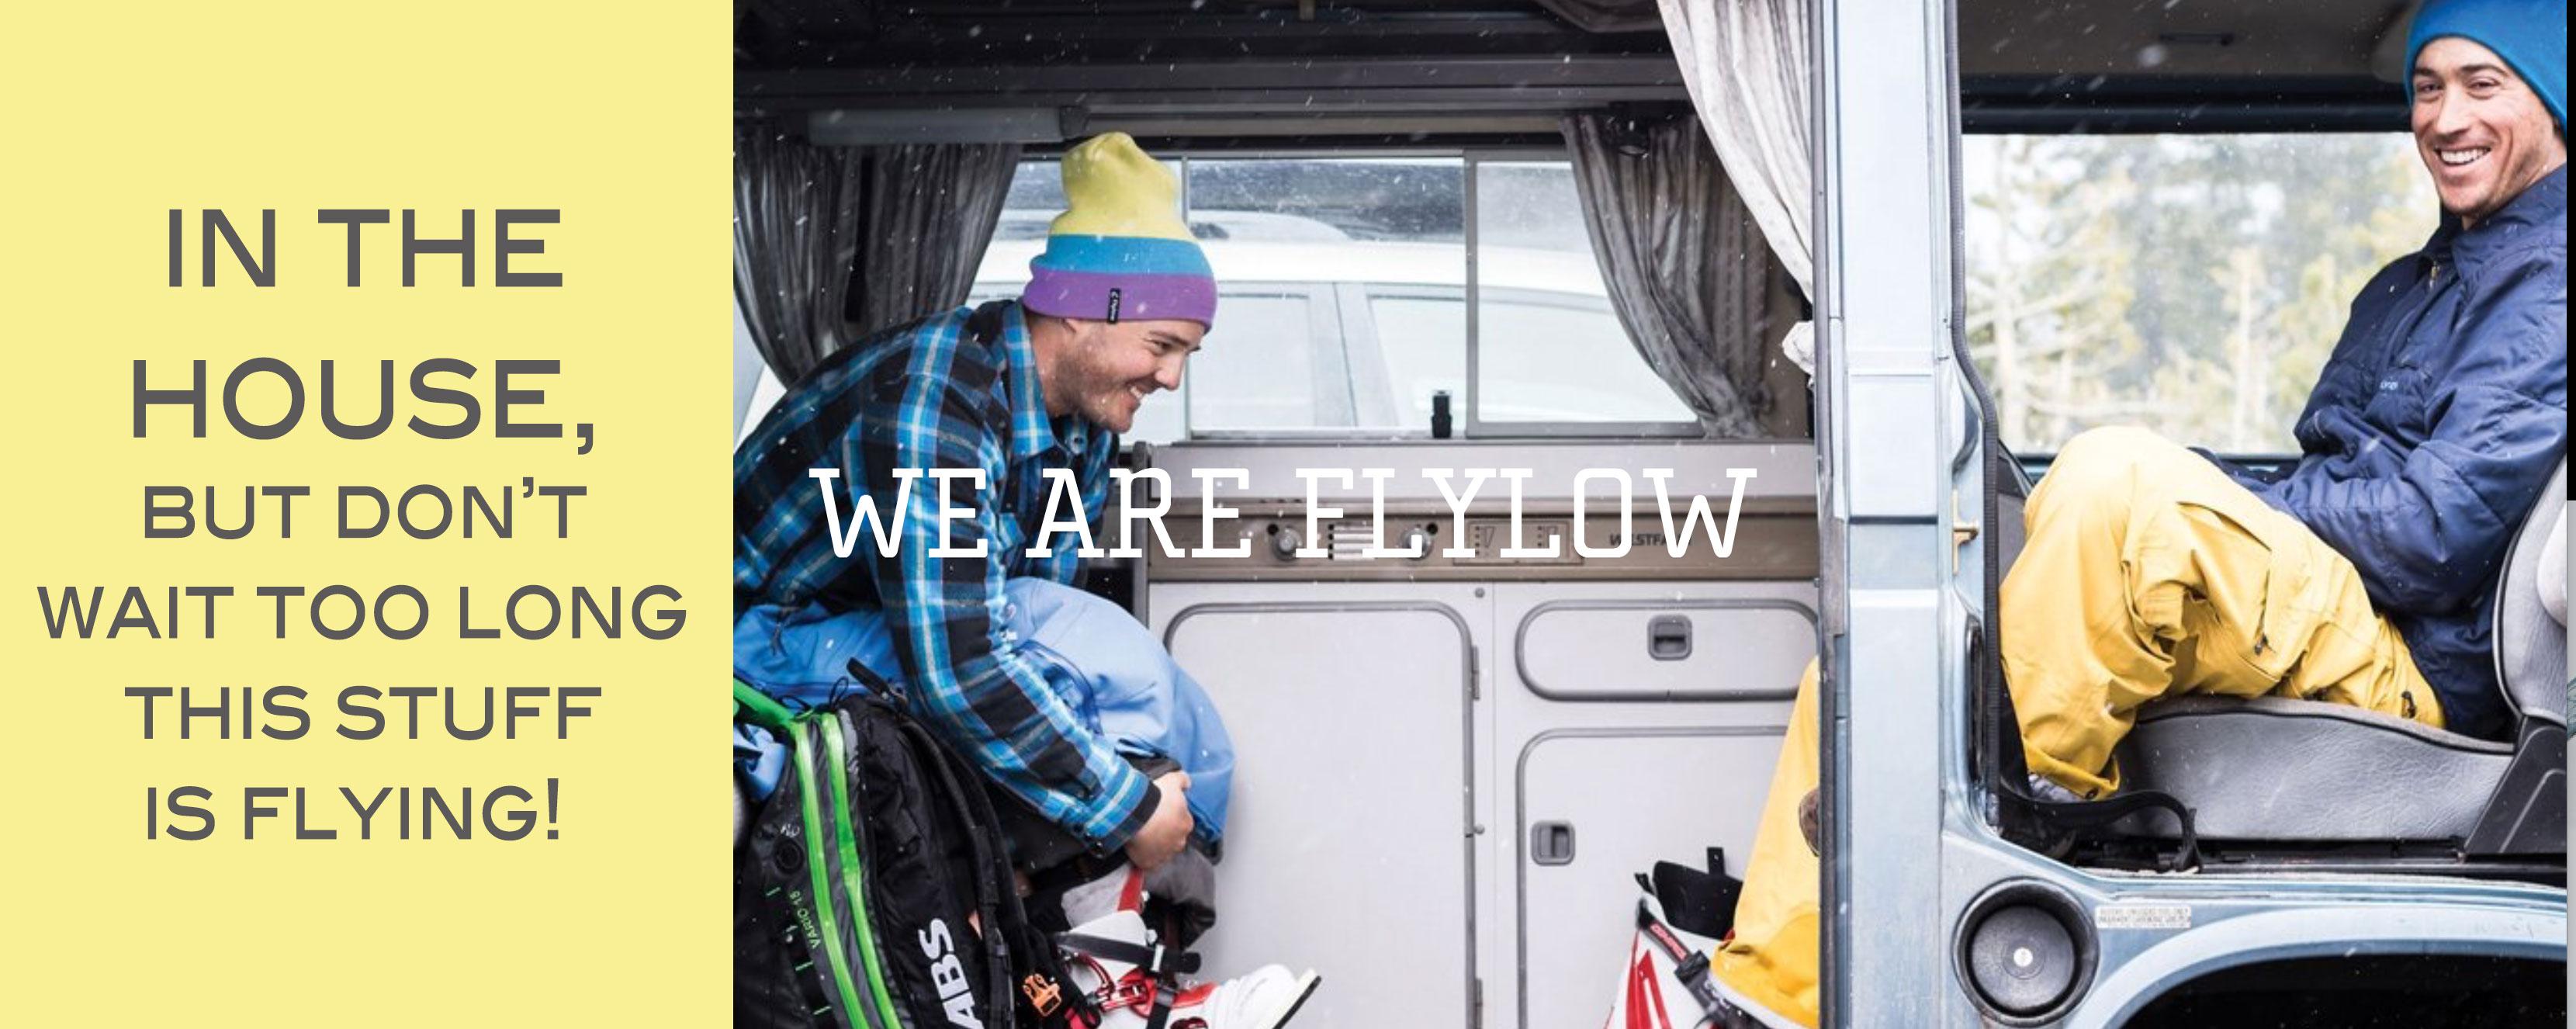 FlyLow Skiwear